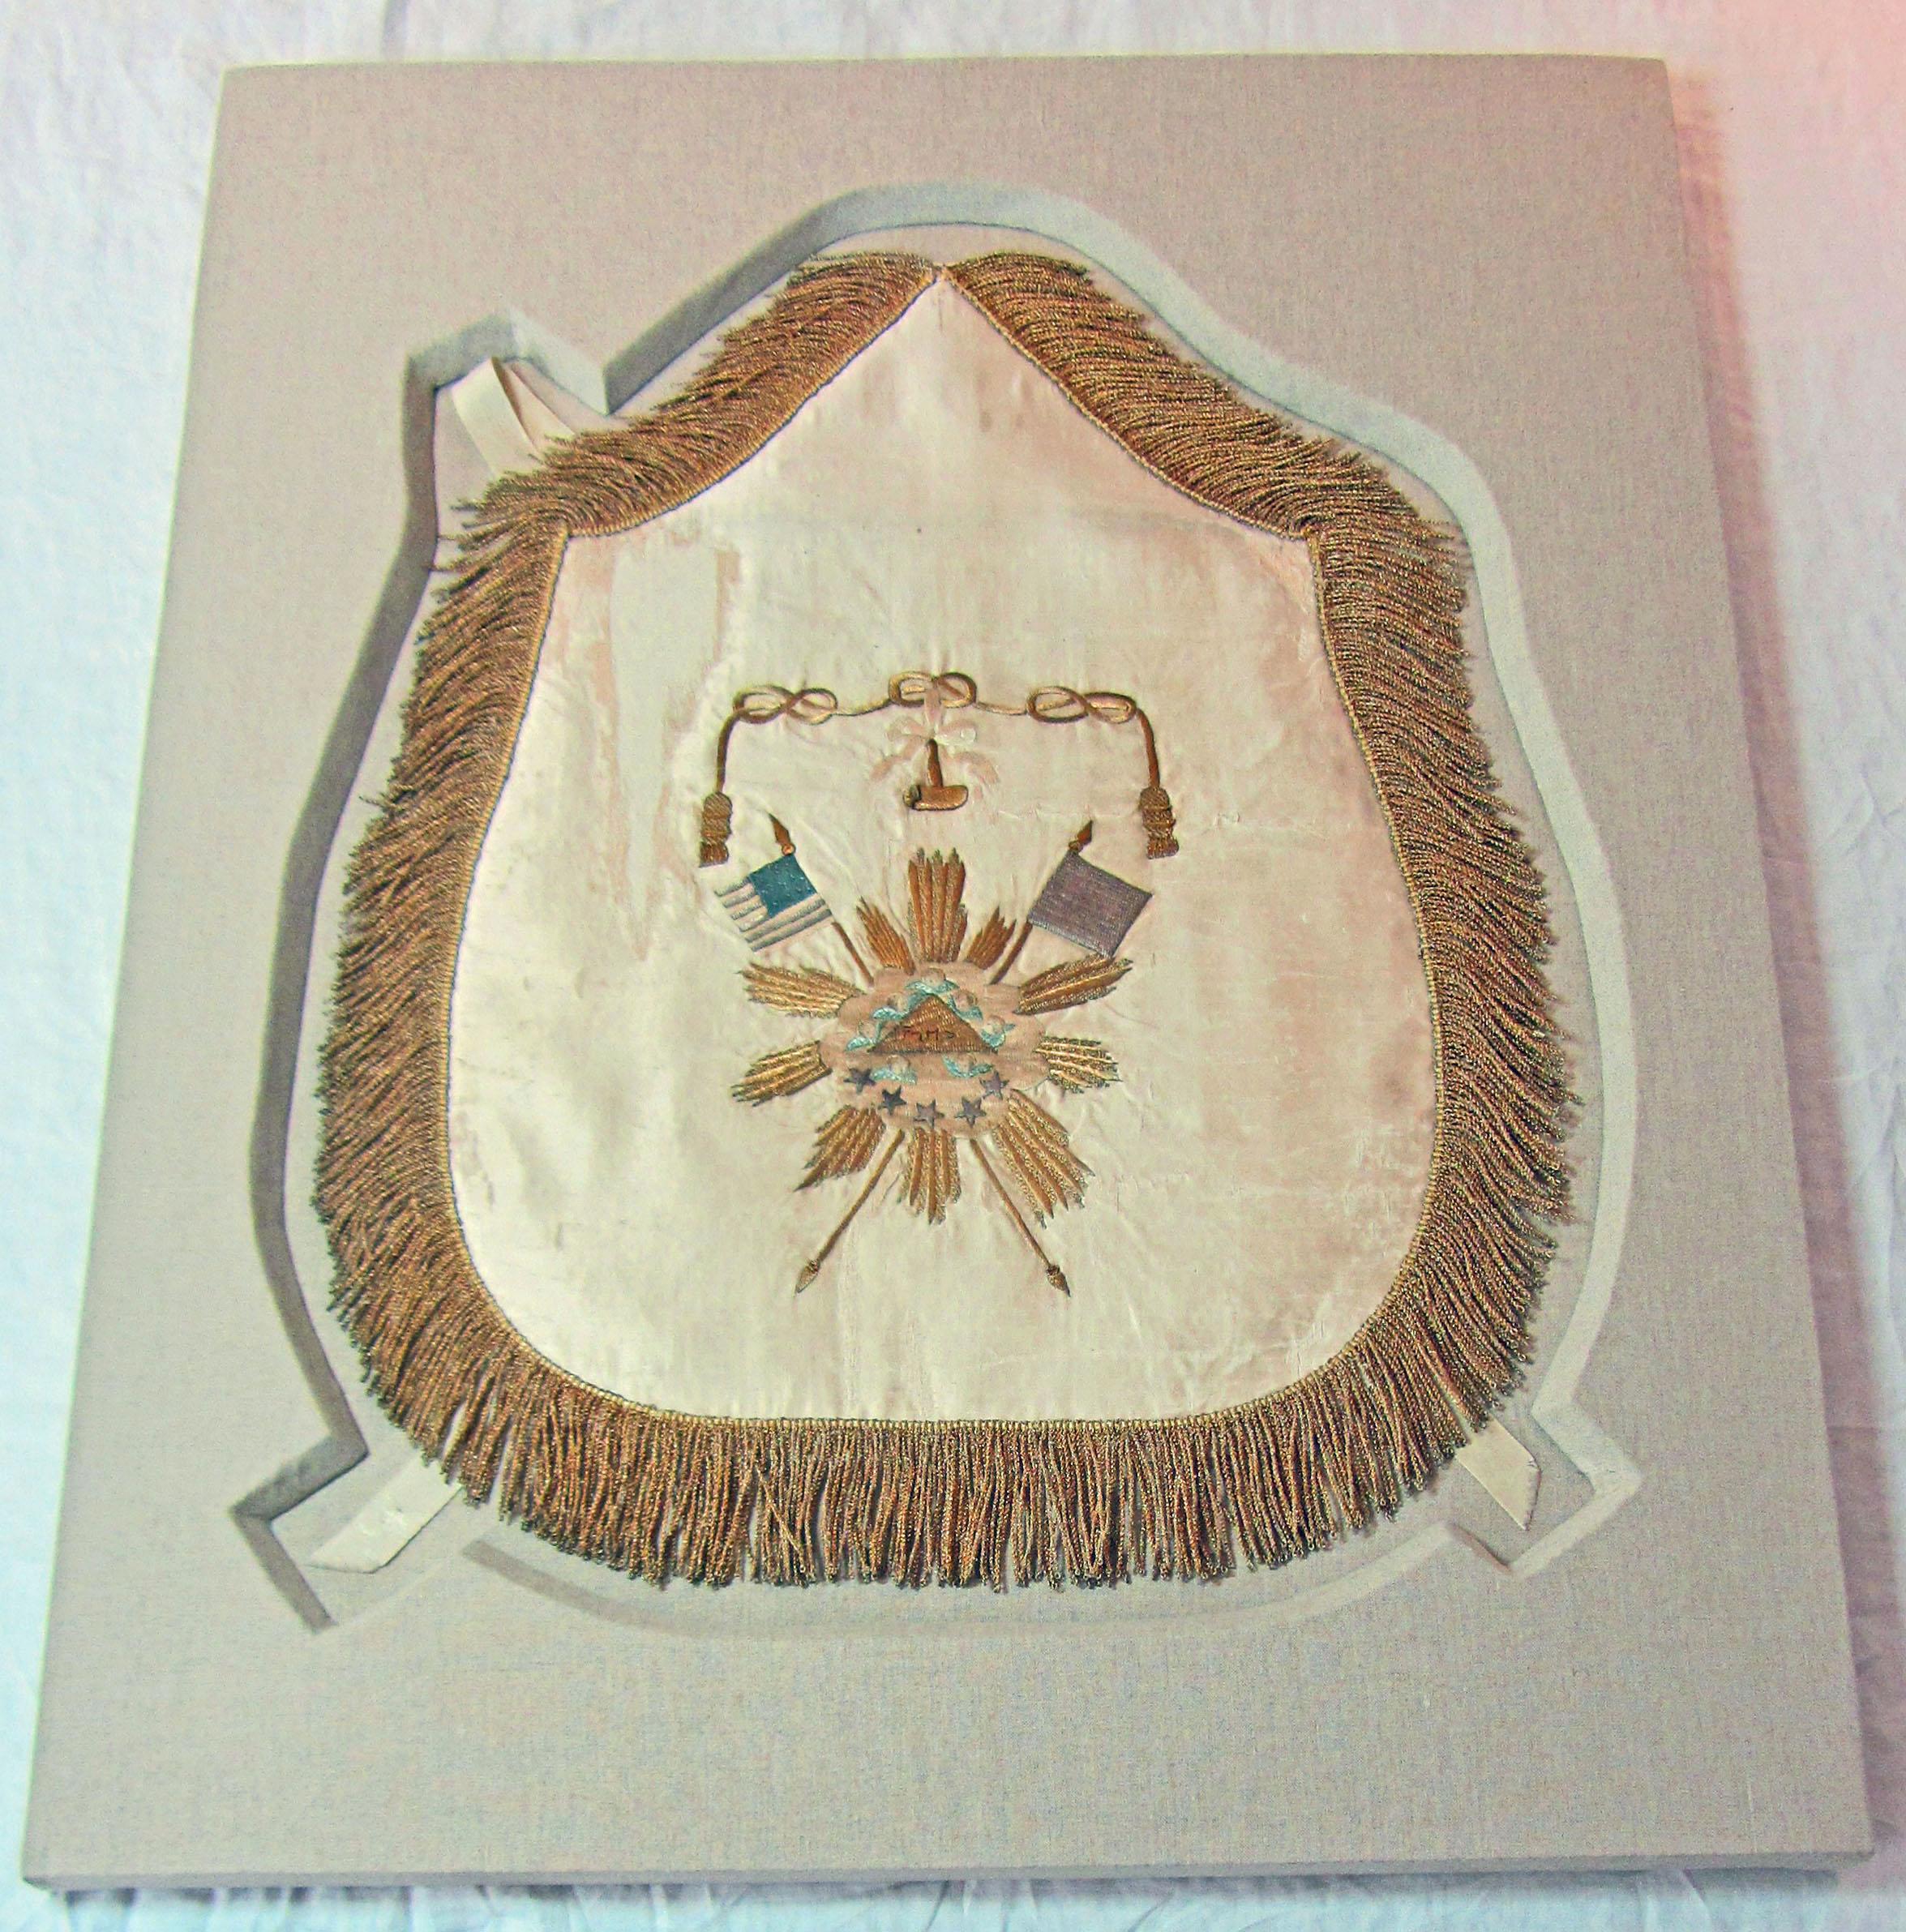 Mount for Masonic Apron